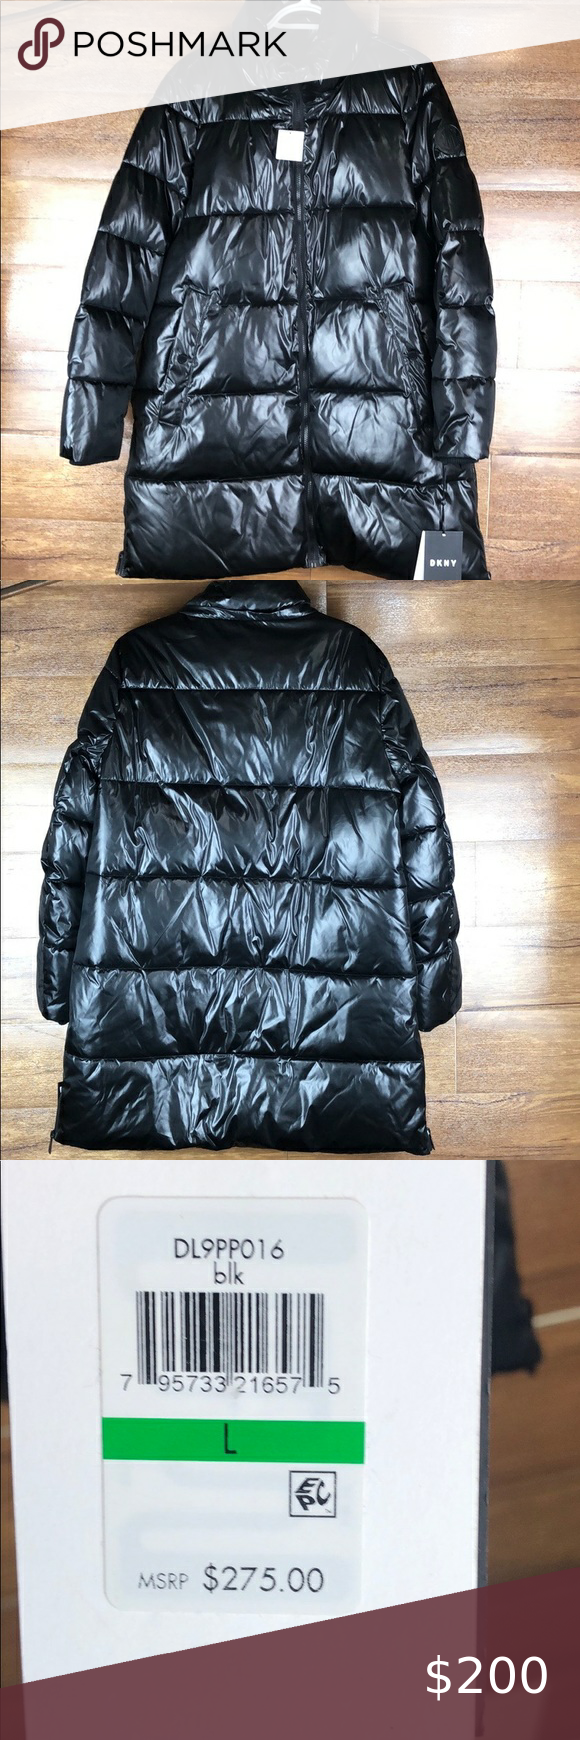 Dkny Long Puffer Jacket Size Large Dkny Womens Winter Puffer Coats Jackets [ 1740 x 580 Pixel ]